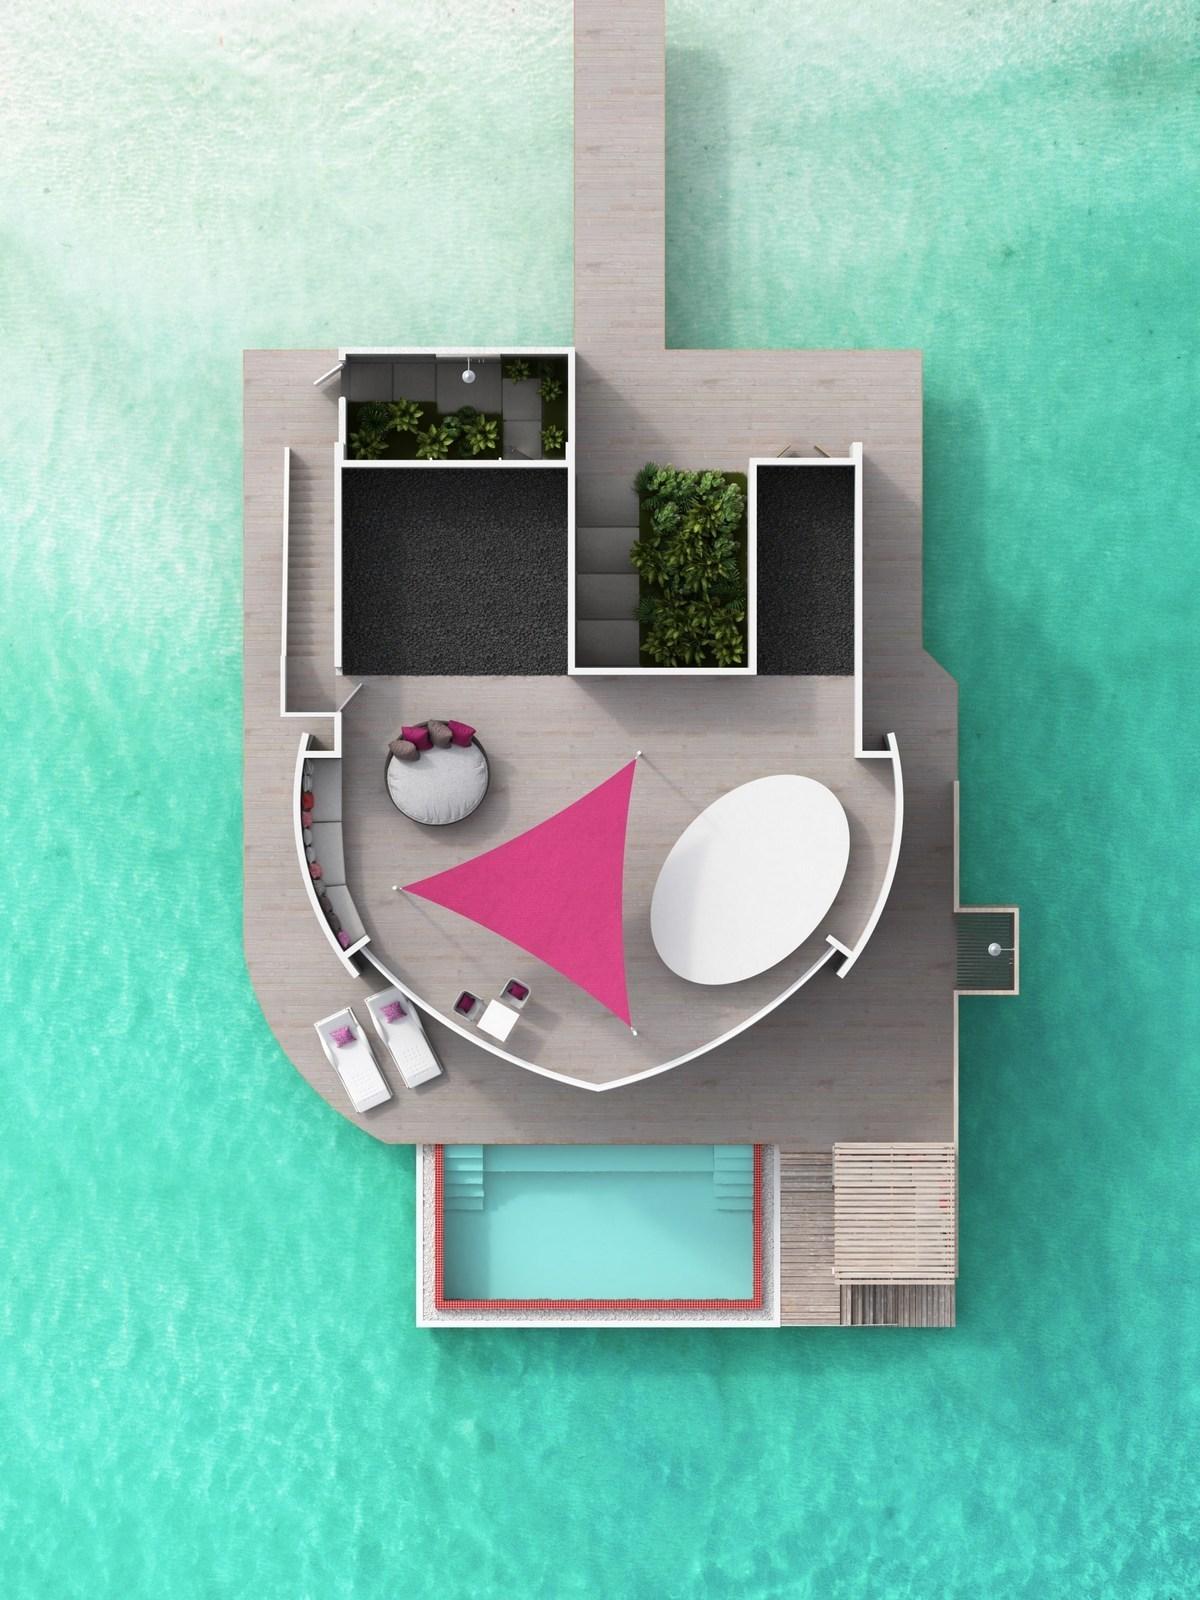 Мальдивы, отель LUX North Male Atoll, план-схема номера Deluxe Water Villa with Pool